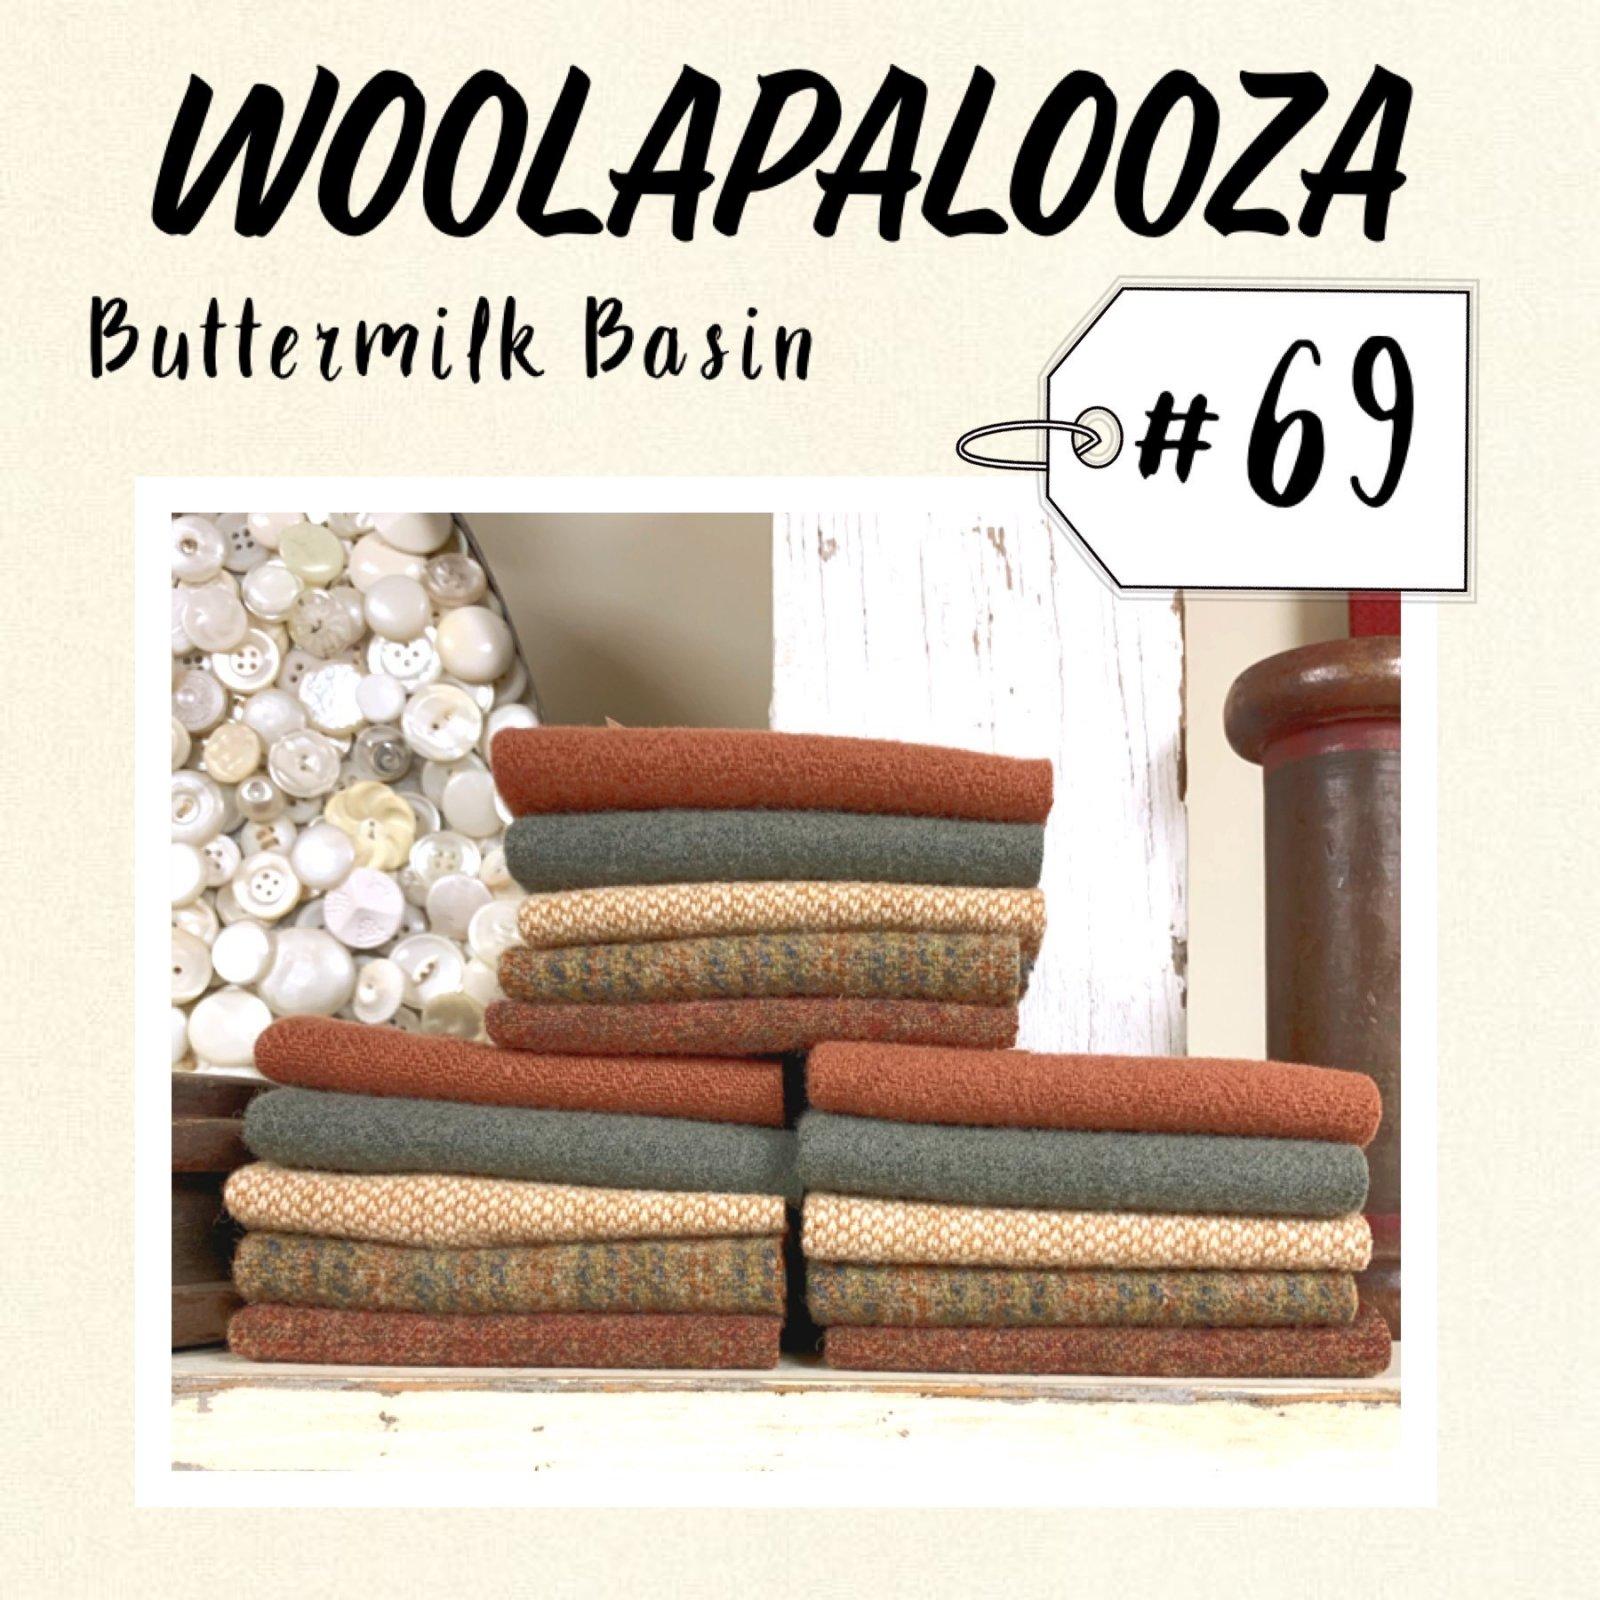 Woolapalooza #69 Wool Bundle